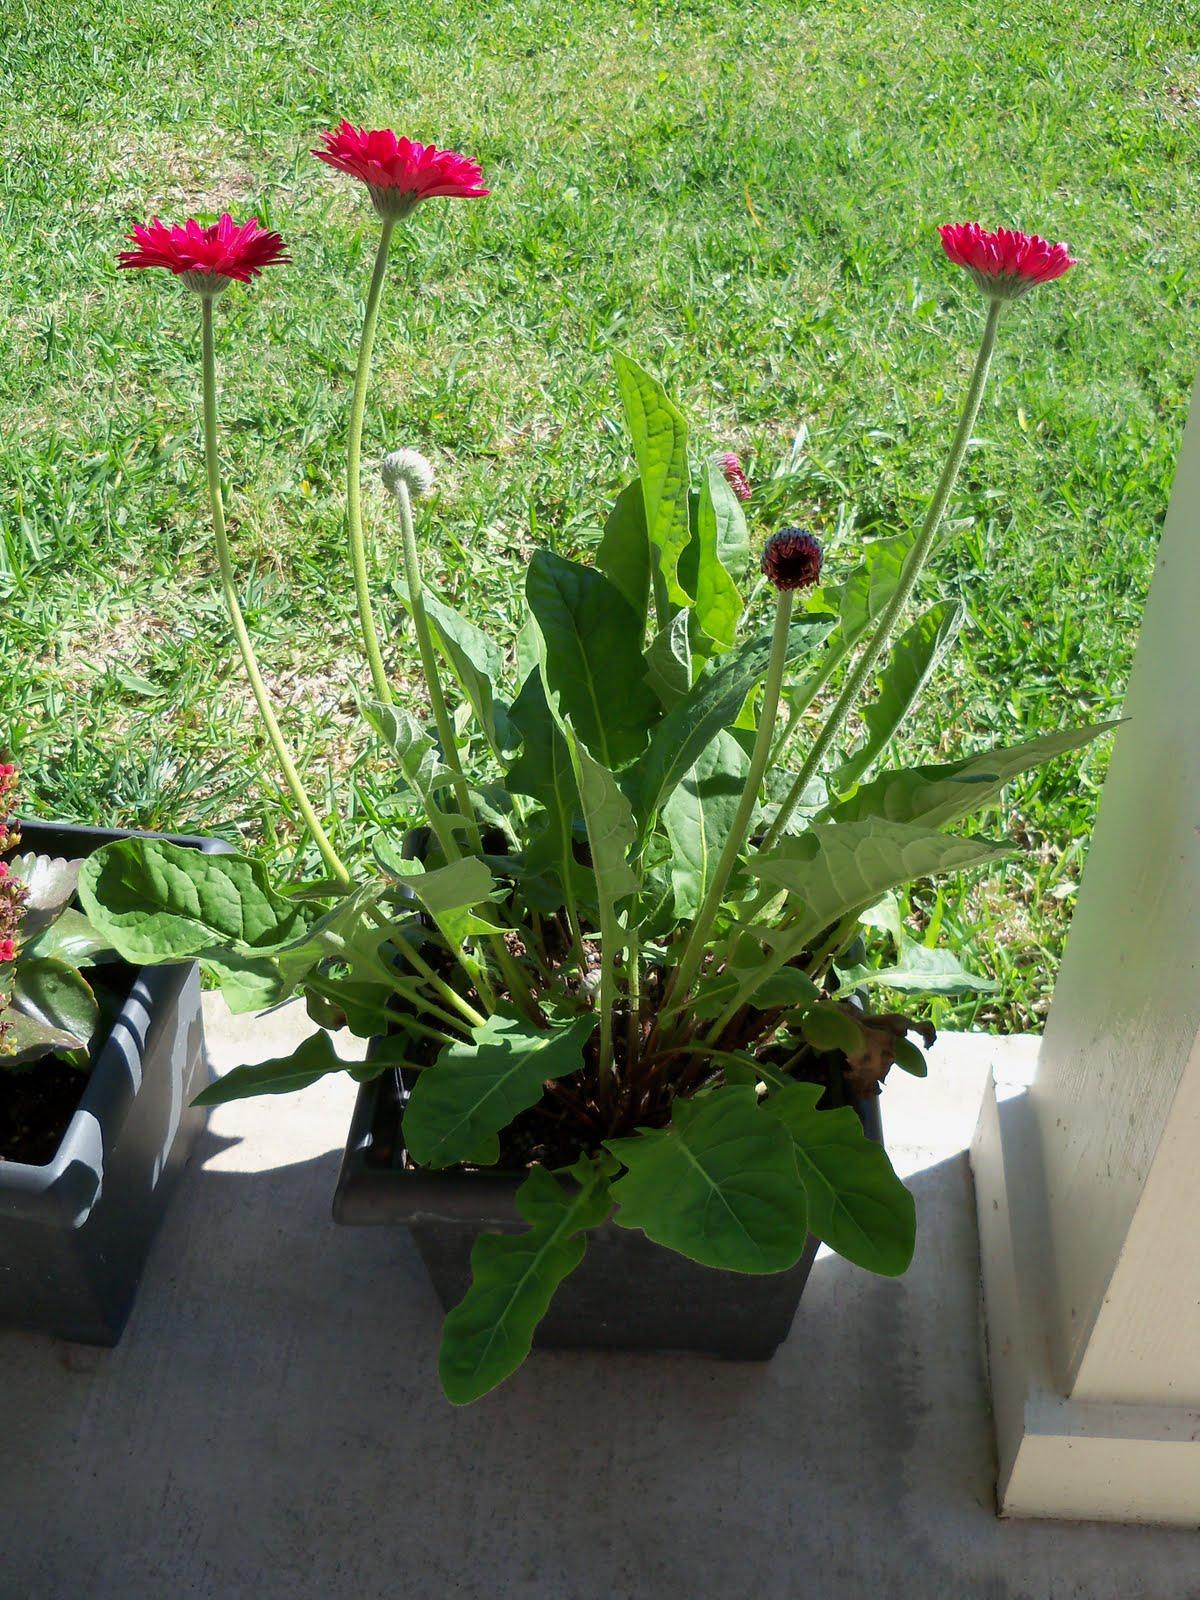 Gardening 2010 - 101_1331.JPG